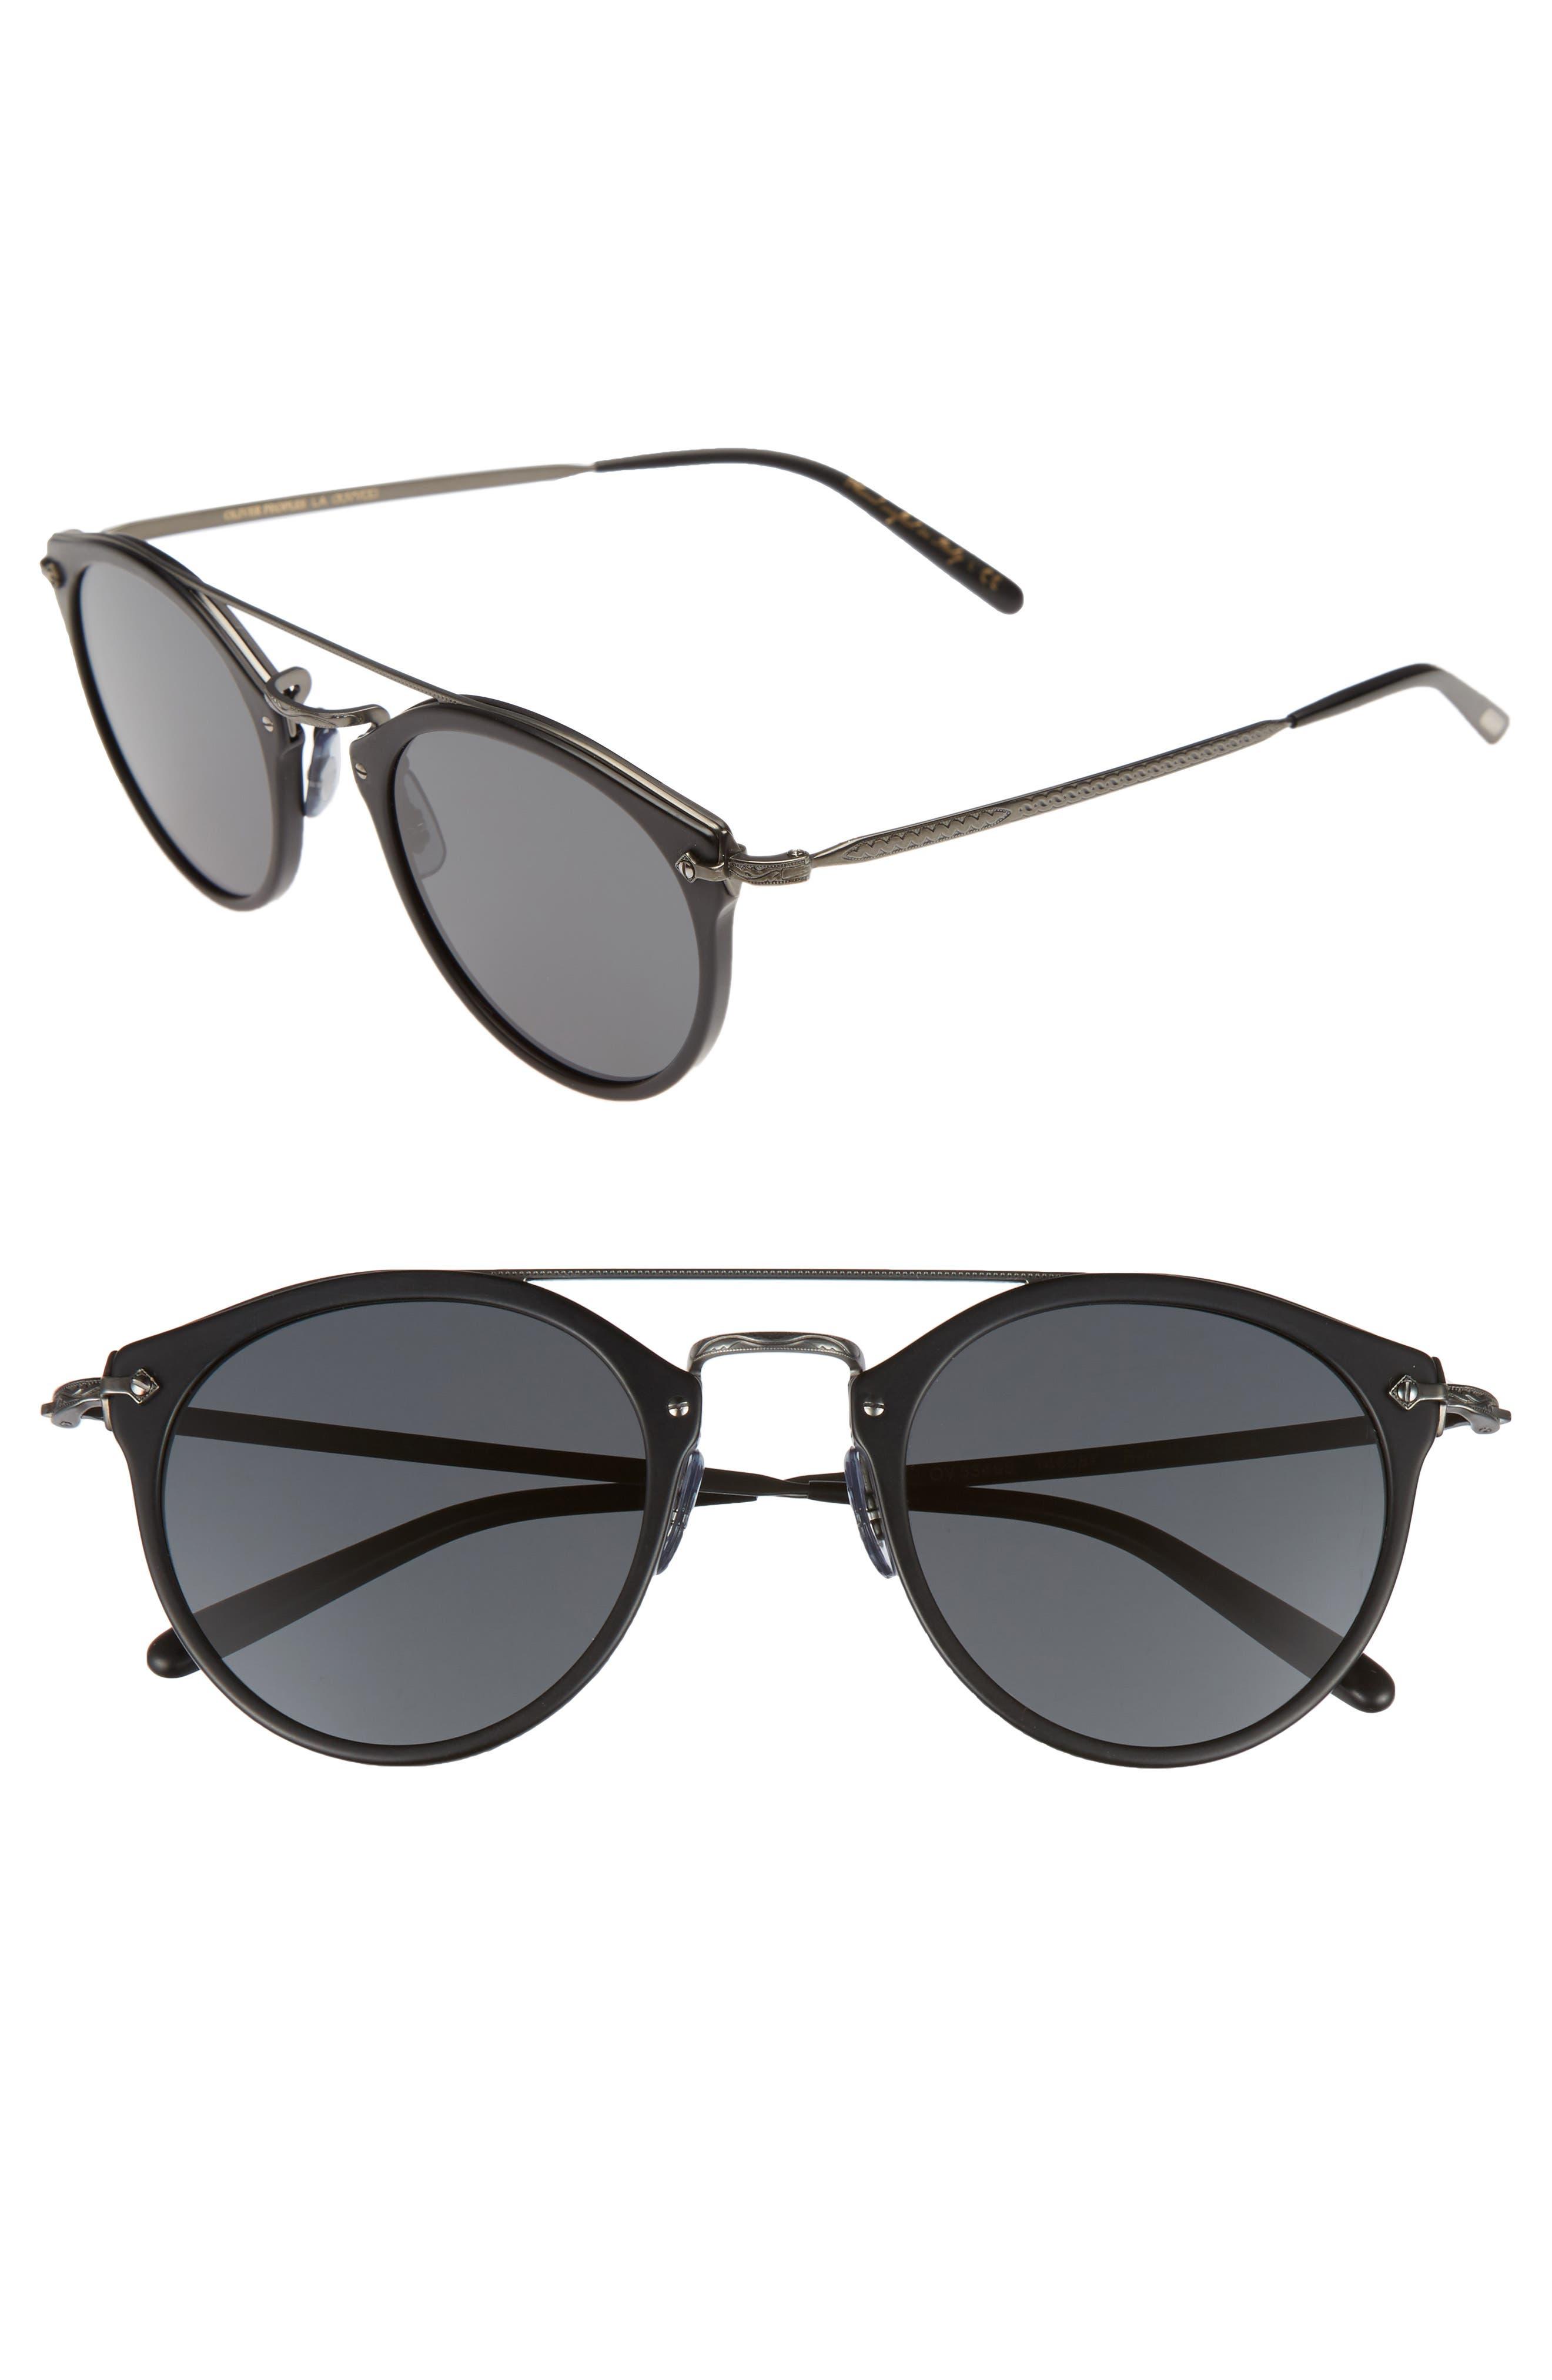 Remick 50mm Sunglasses,                             Main thumbnail 1, color,                             001